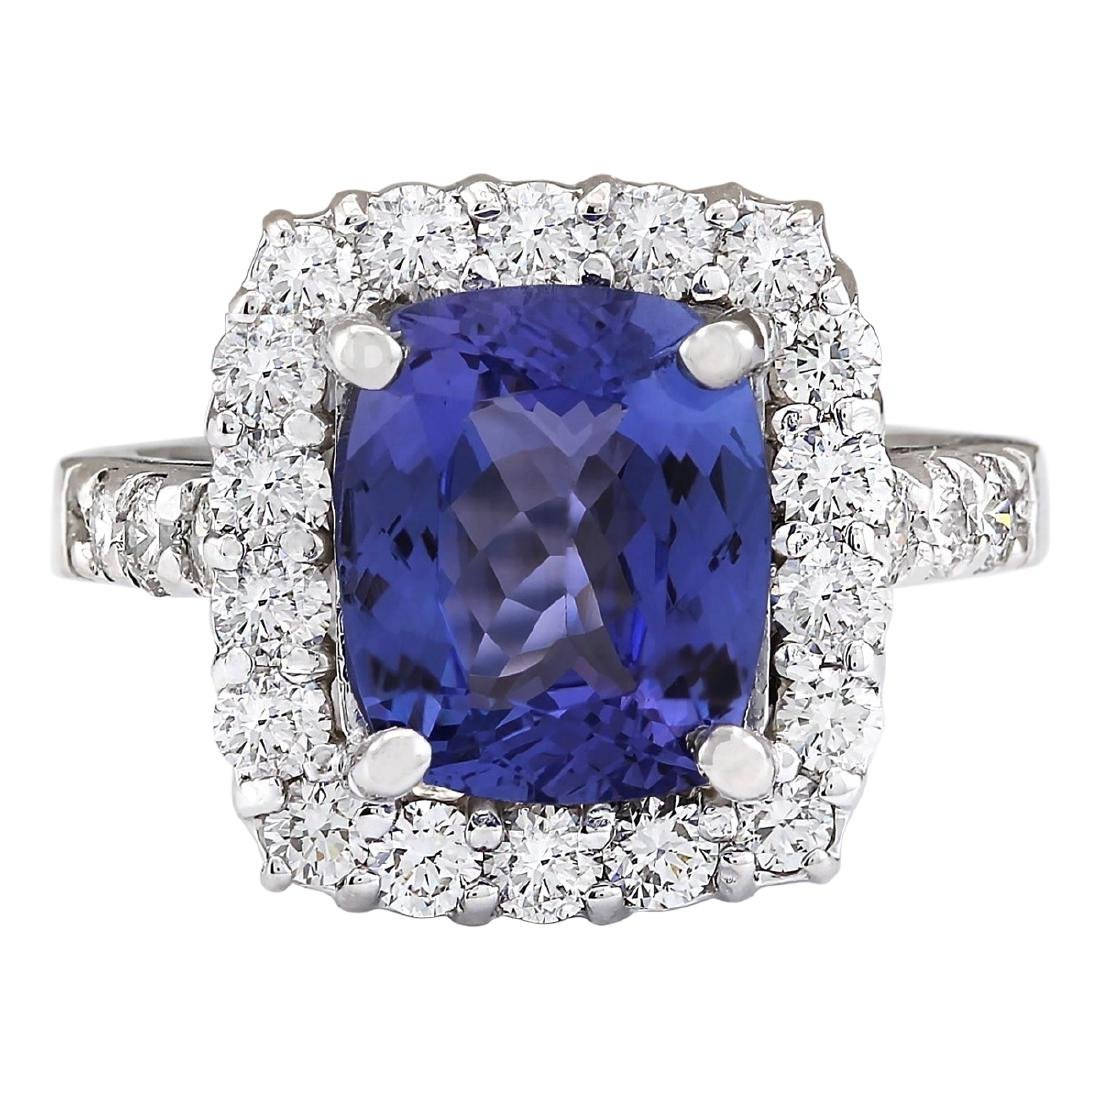 4.95 CTW Natural Blue Tanzanite And Diamond Ring 18K